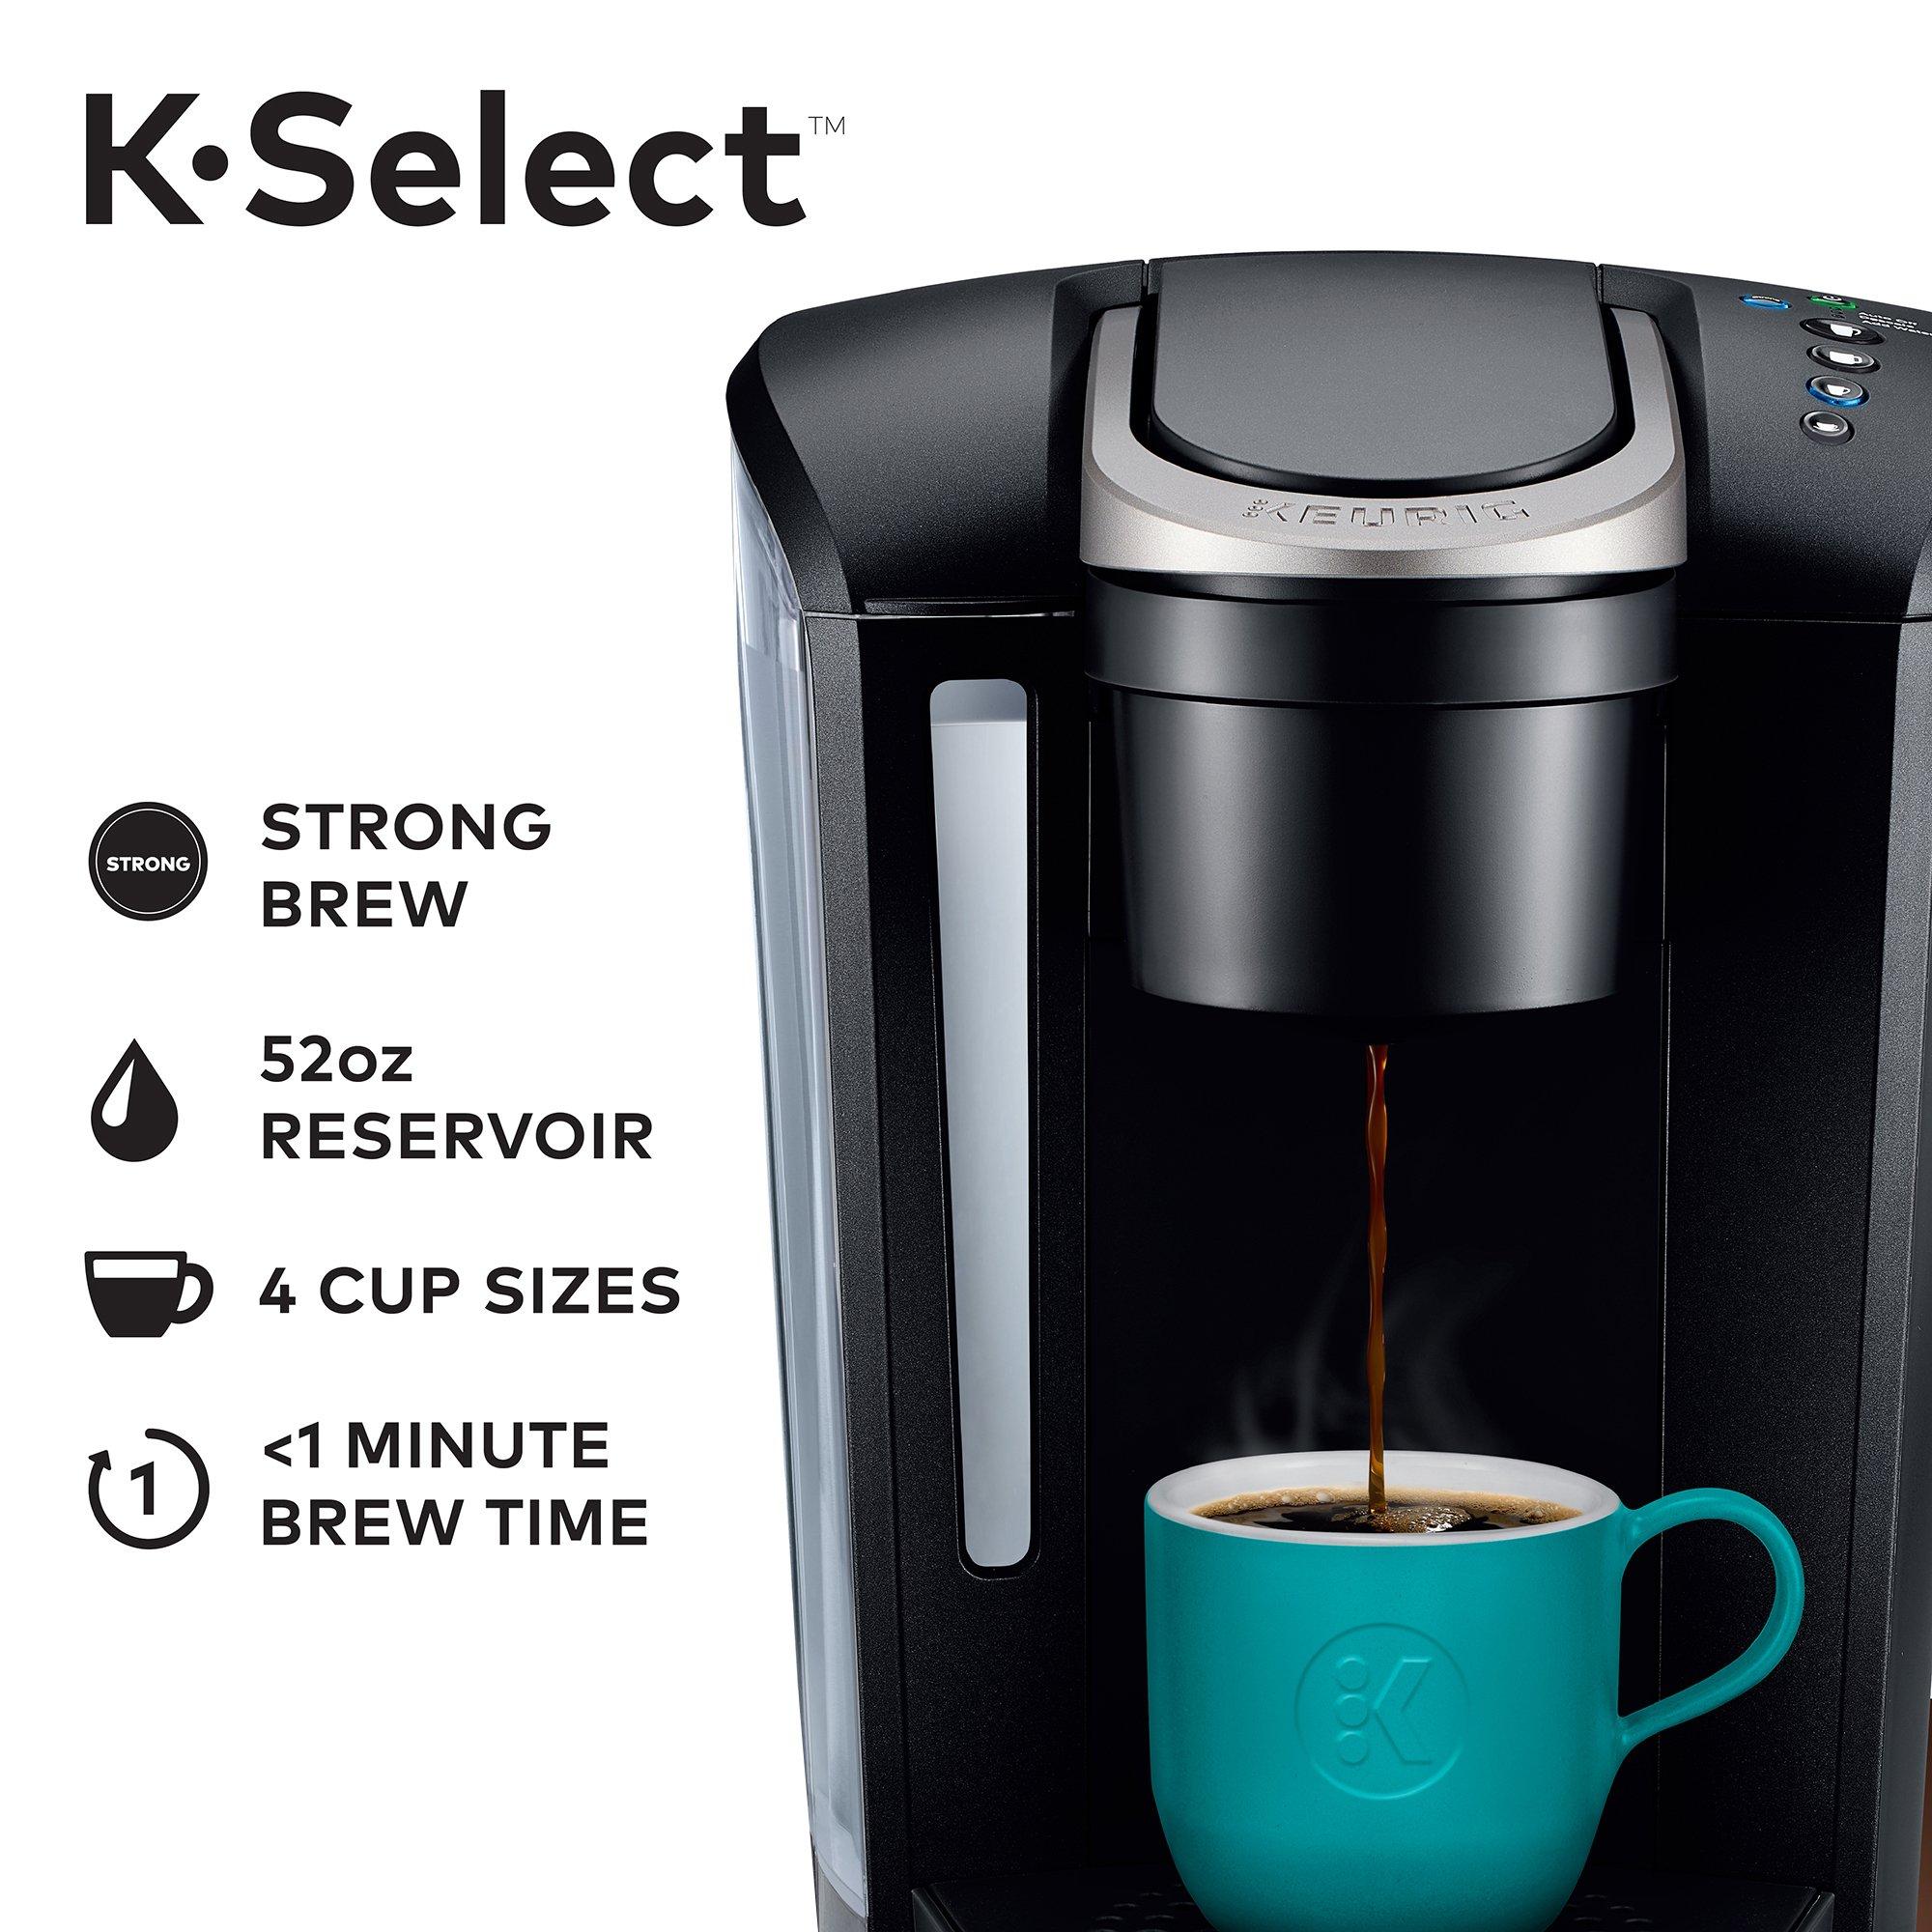 Keurig K-Select Single-Serve K-Cup Pod Coffee Maker with 12oz Brew Size, Strength Control, Matte Black by Keurig (Image #2)